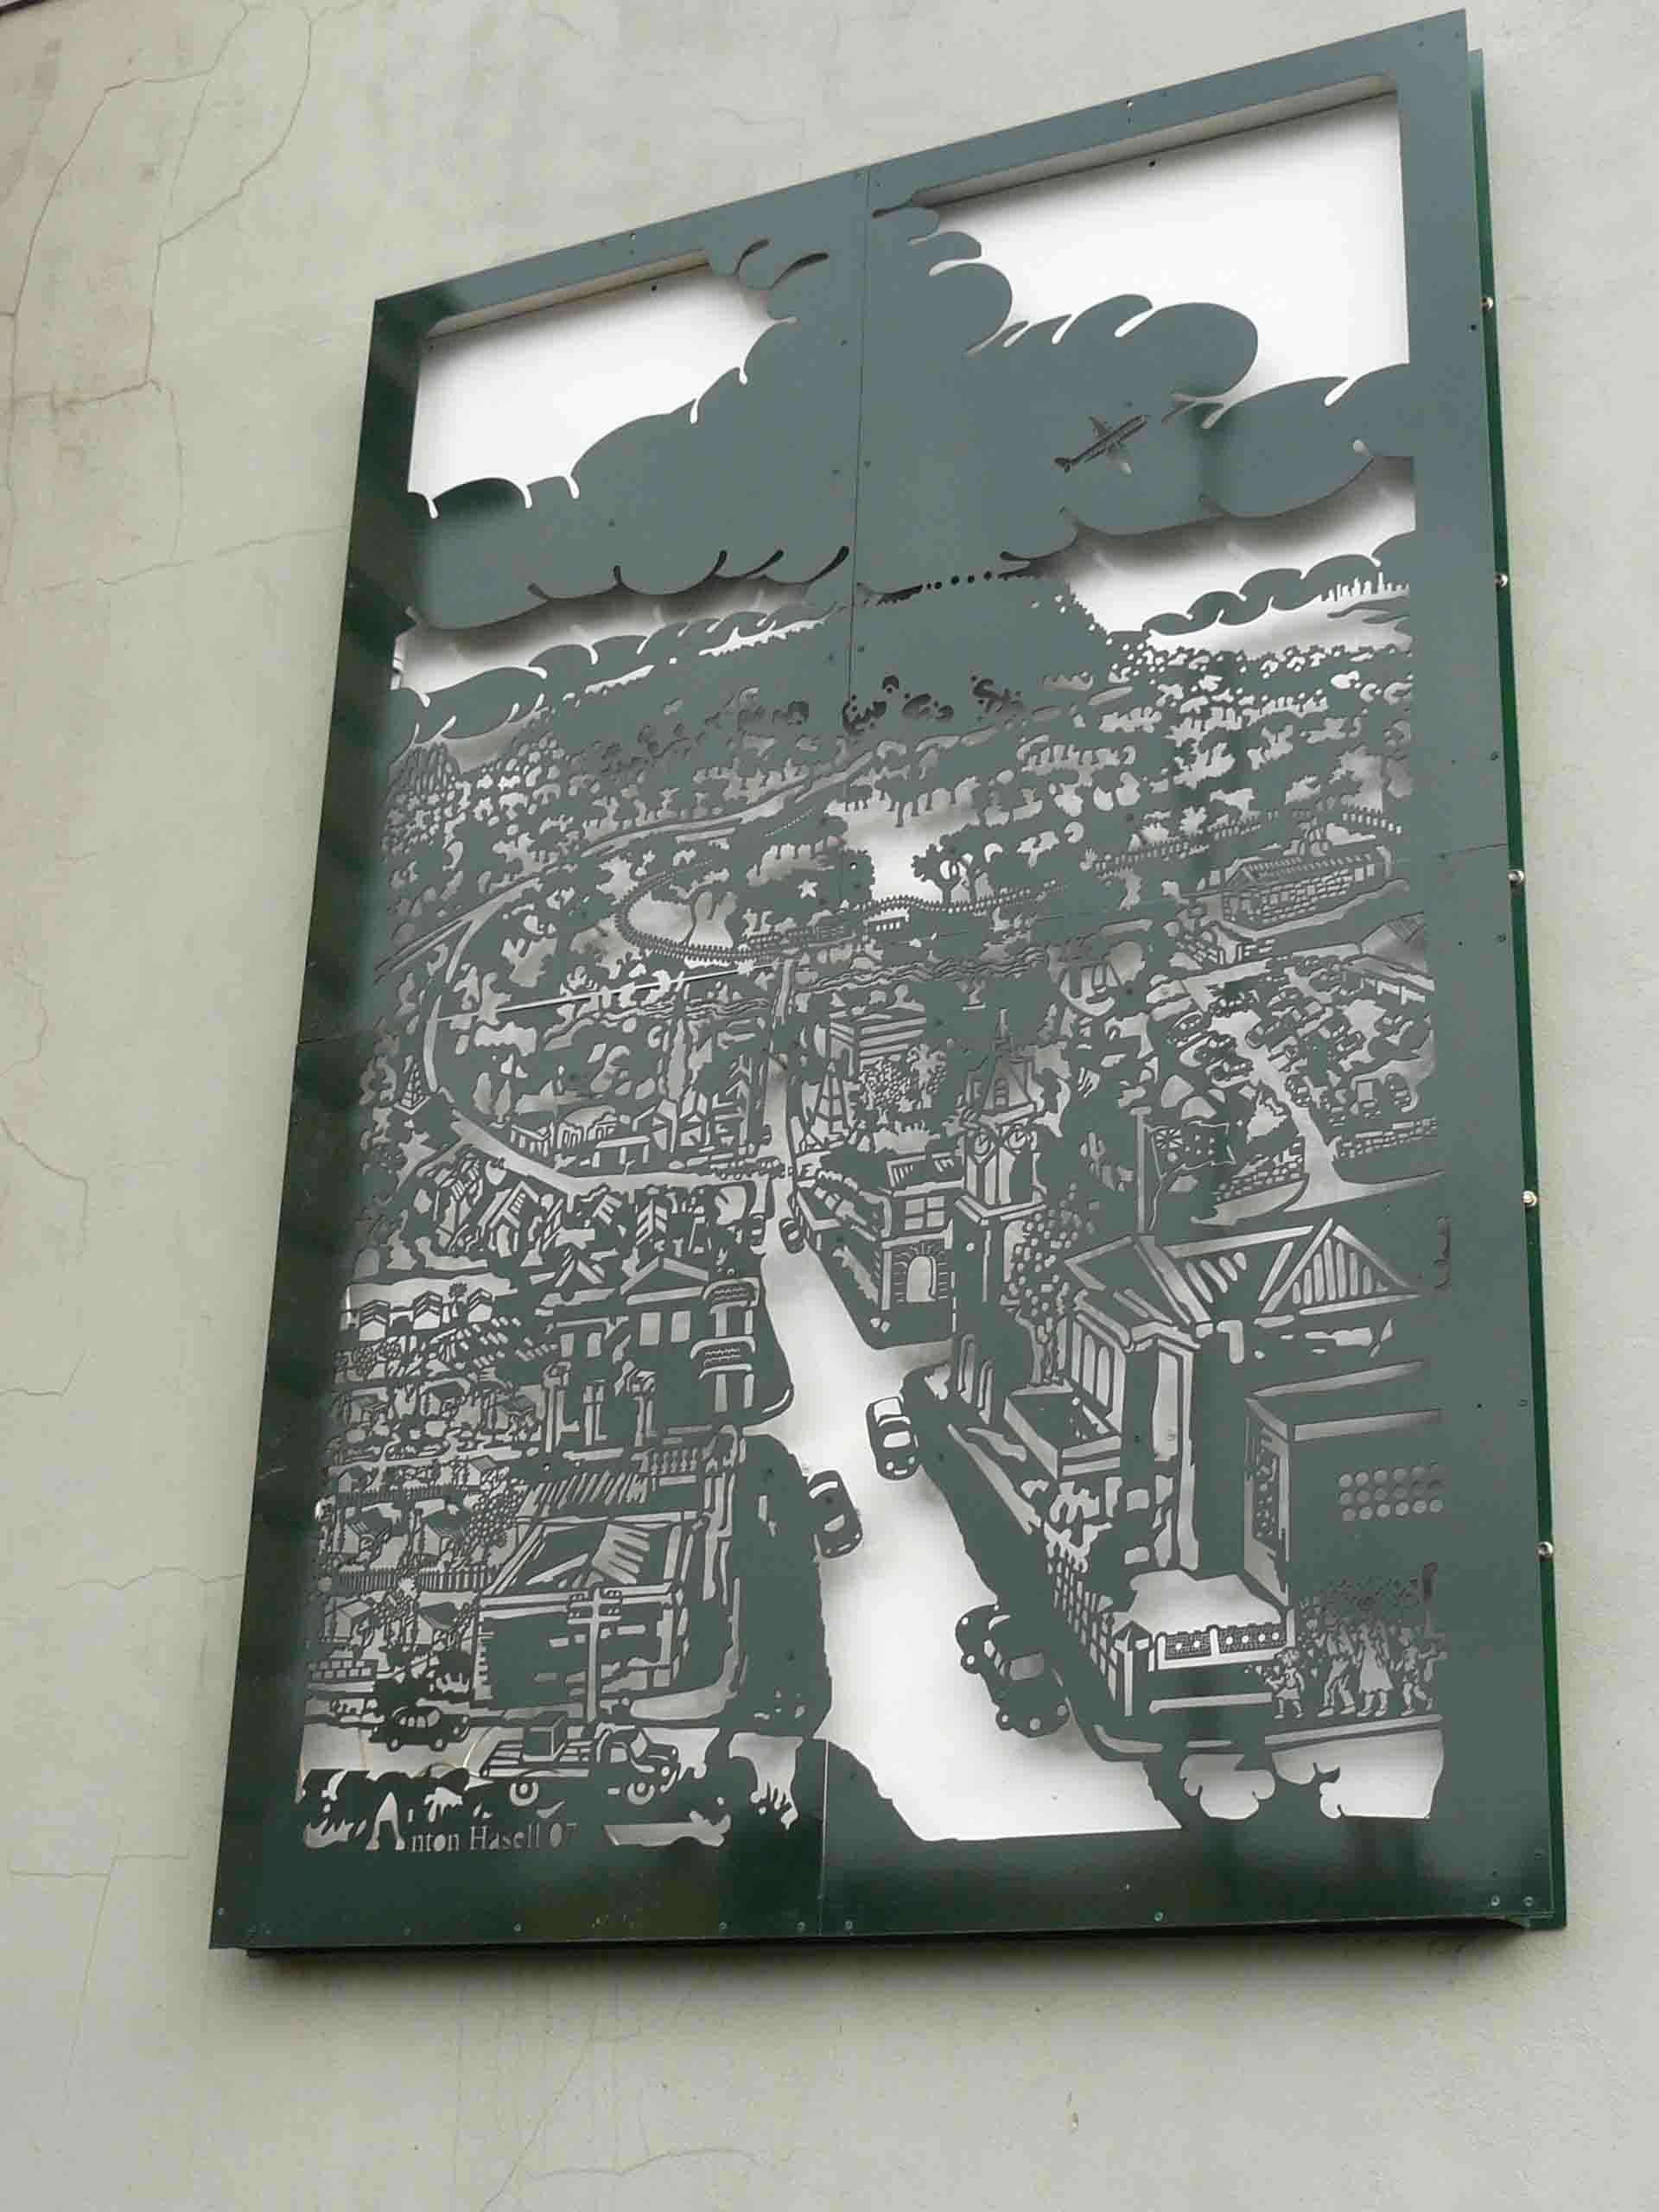 Hasell 'Kyneton wall panel' Town Hall 2007